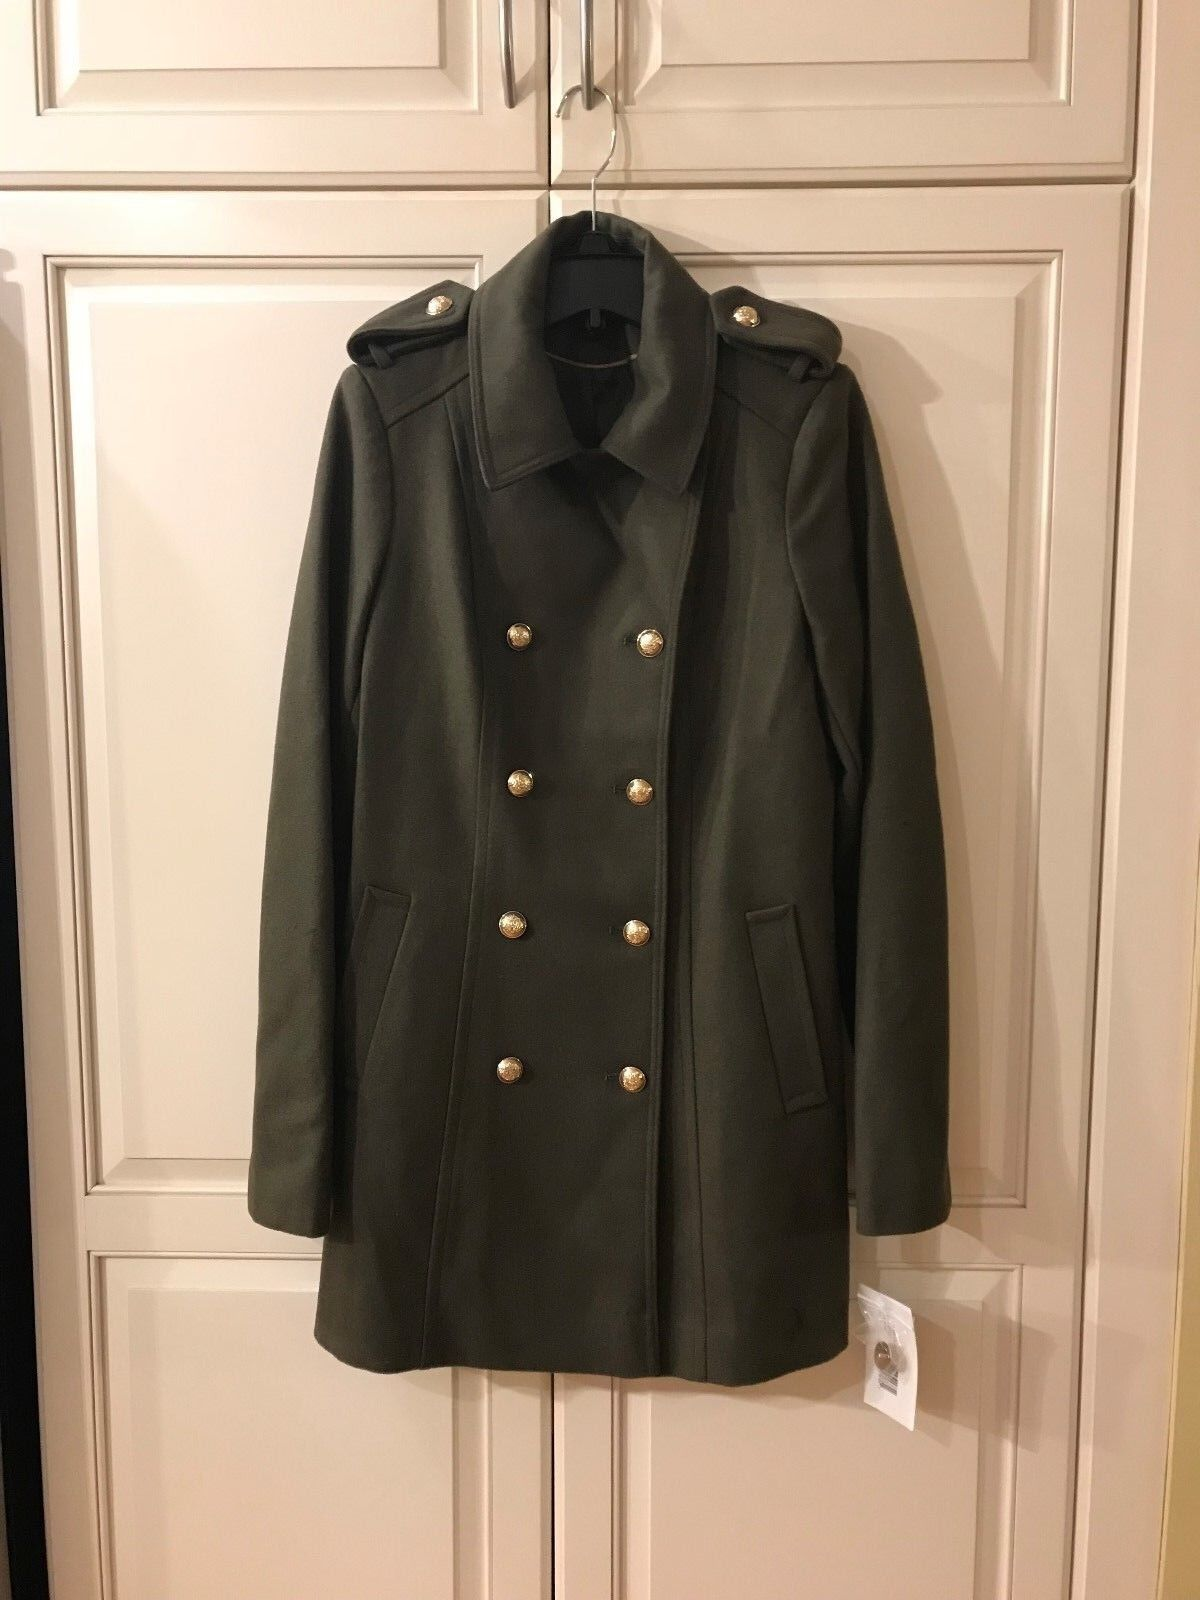 NWT Via Via Via Spiga Women's Double-Breasted Military Wool-Blend Coat 10 LUSHOLIVE  360 35edcb